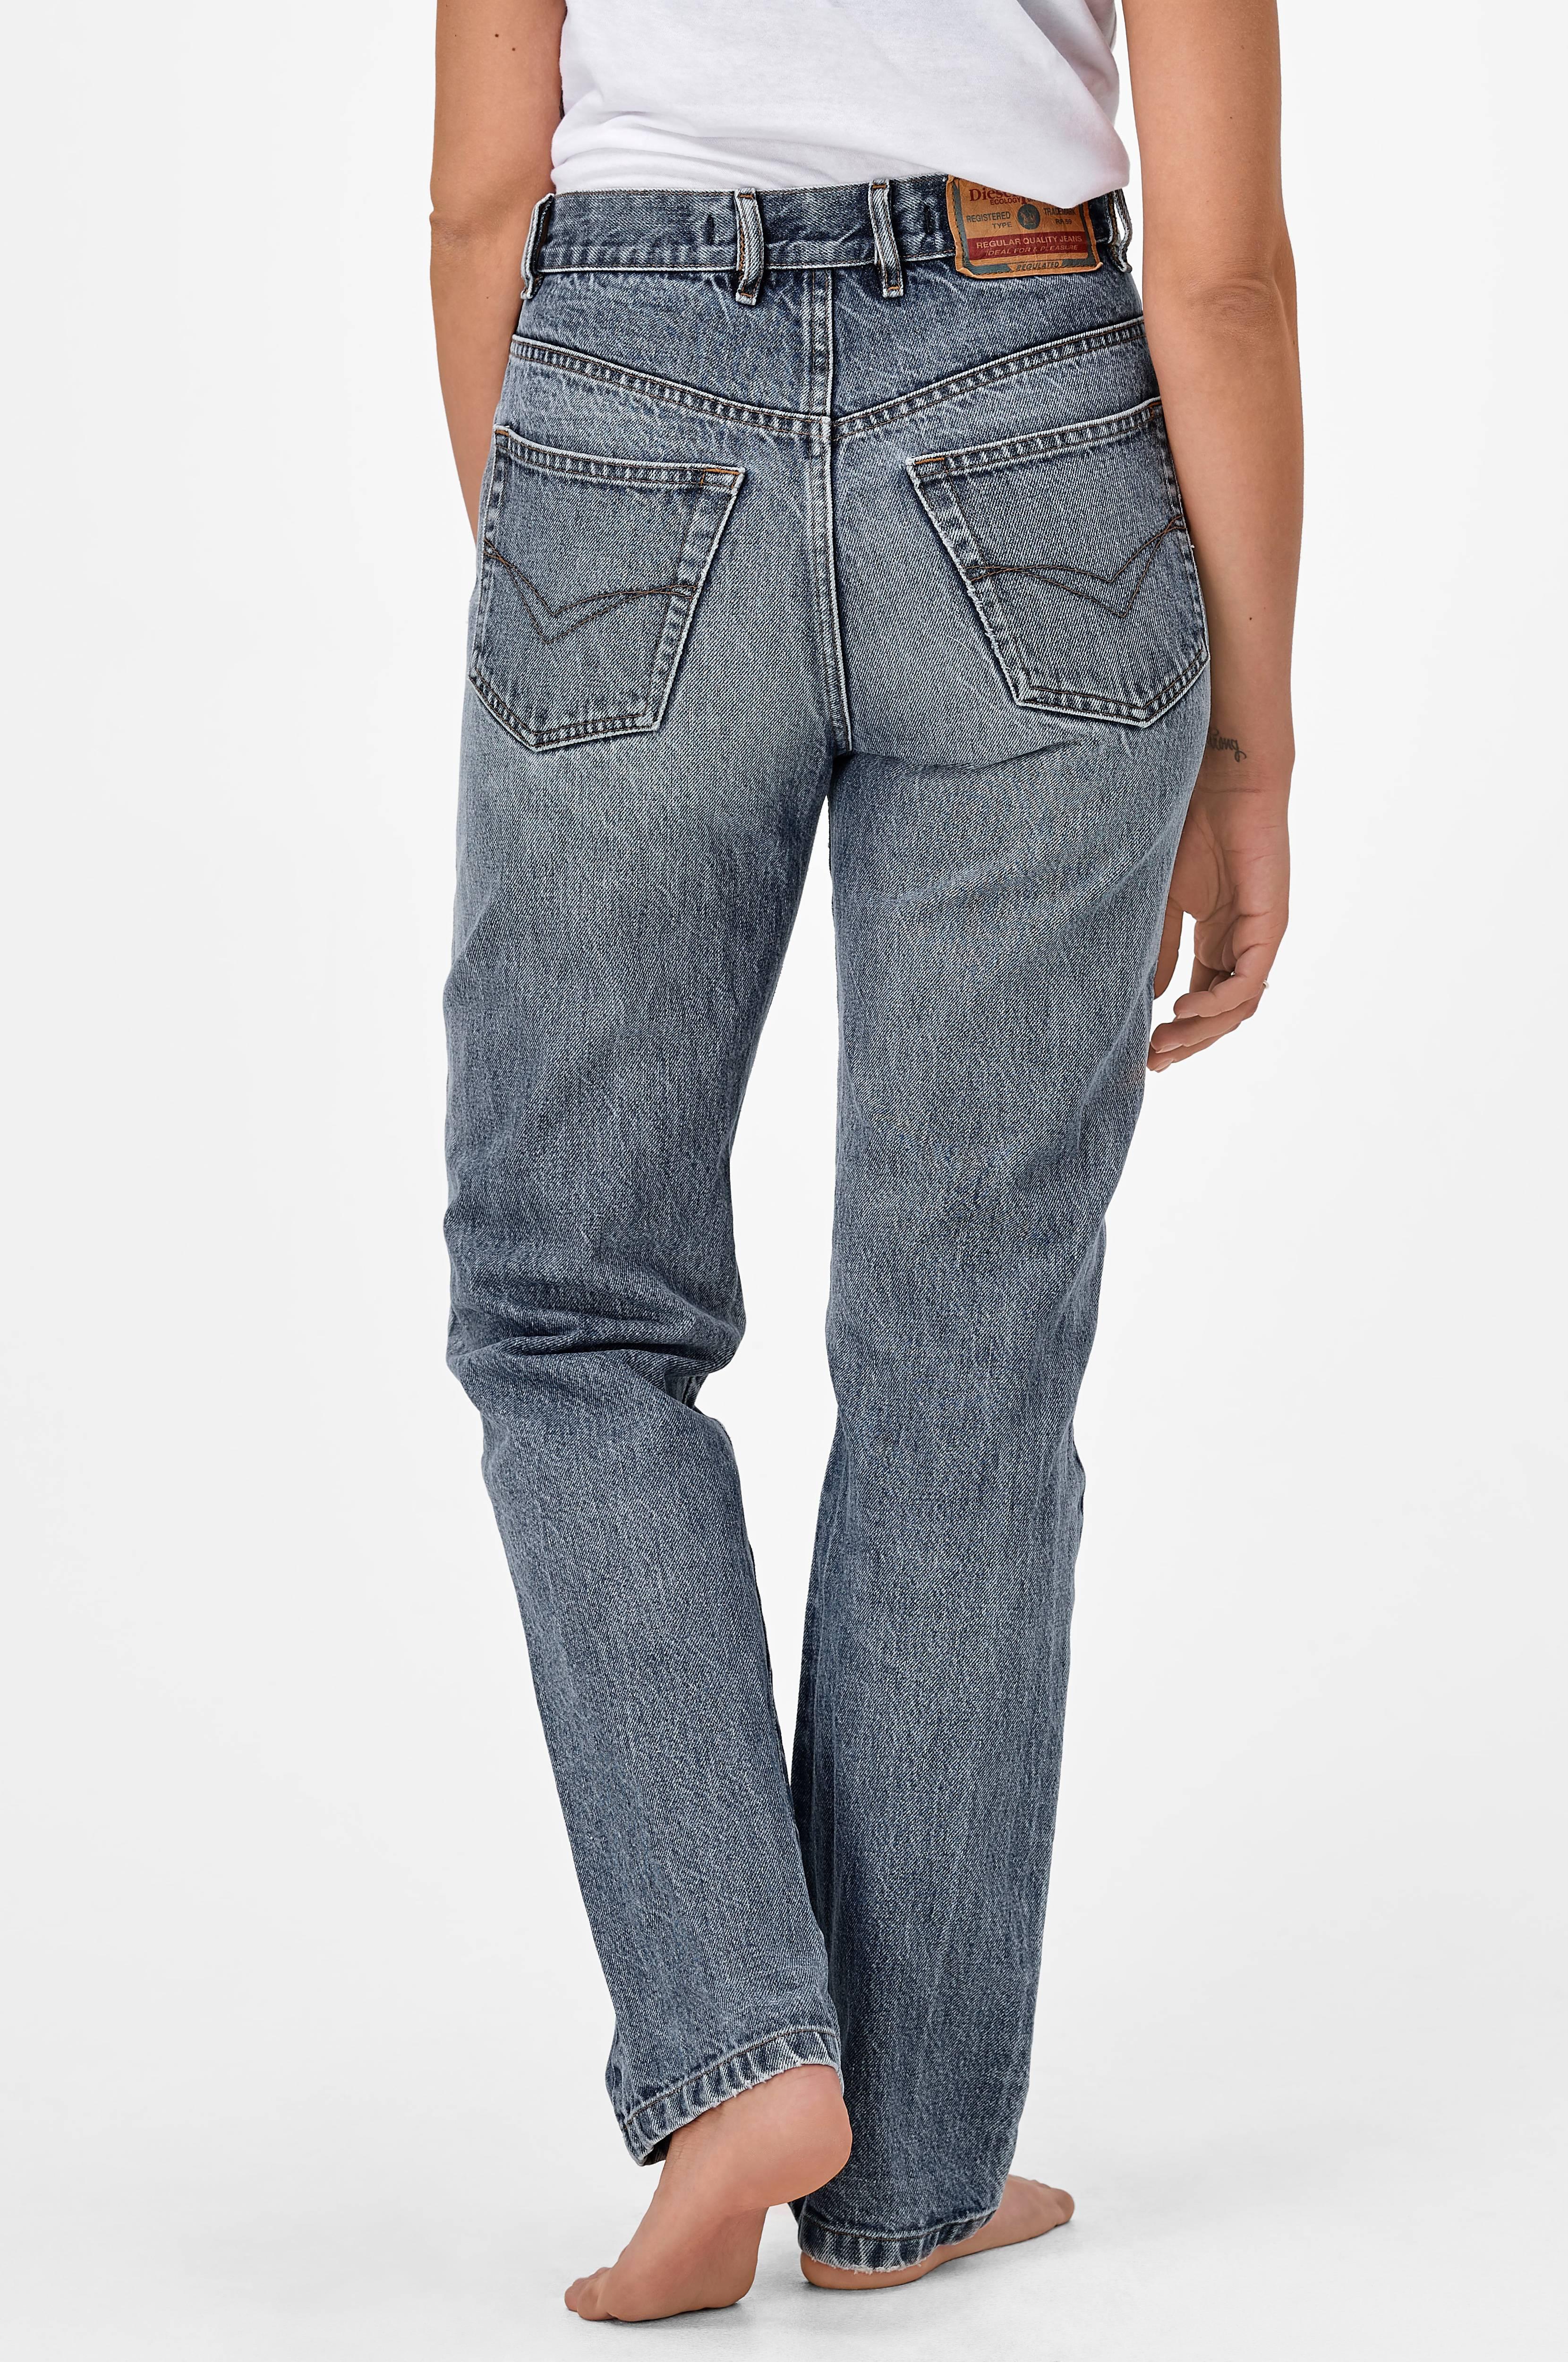 Ellos Collection Jeans Diesel - Blå - Dame - Ellos.dk